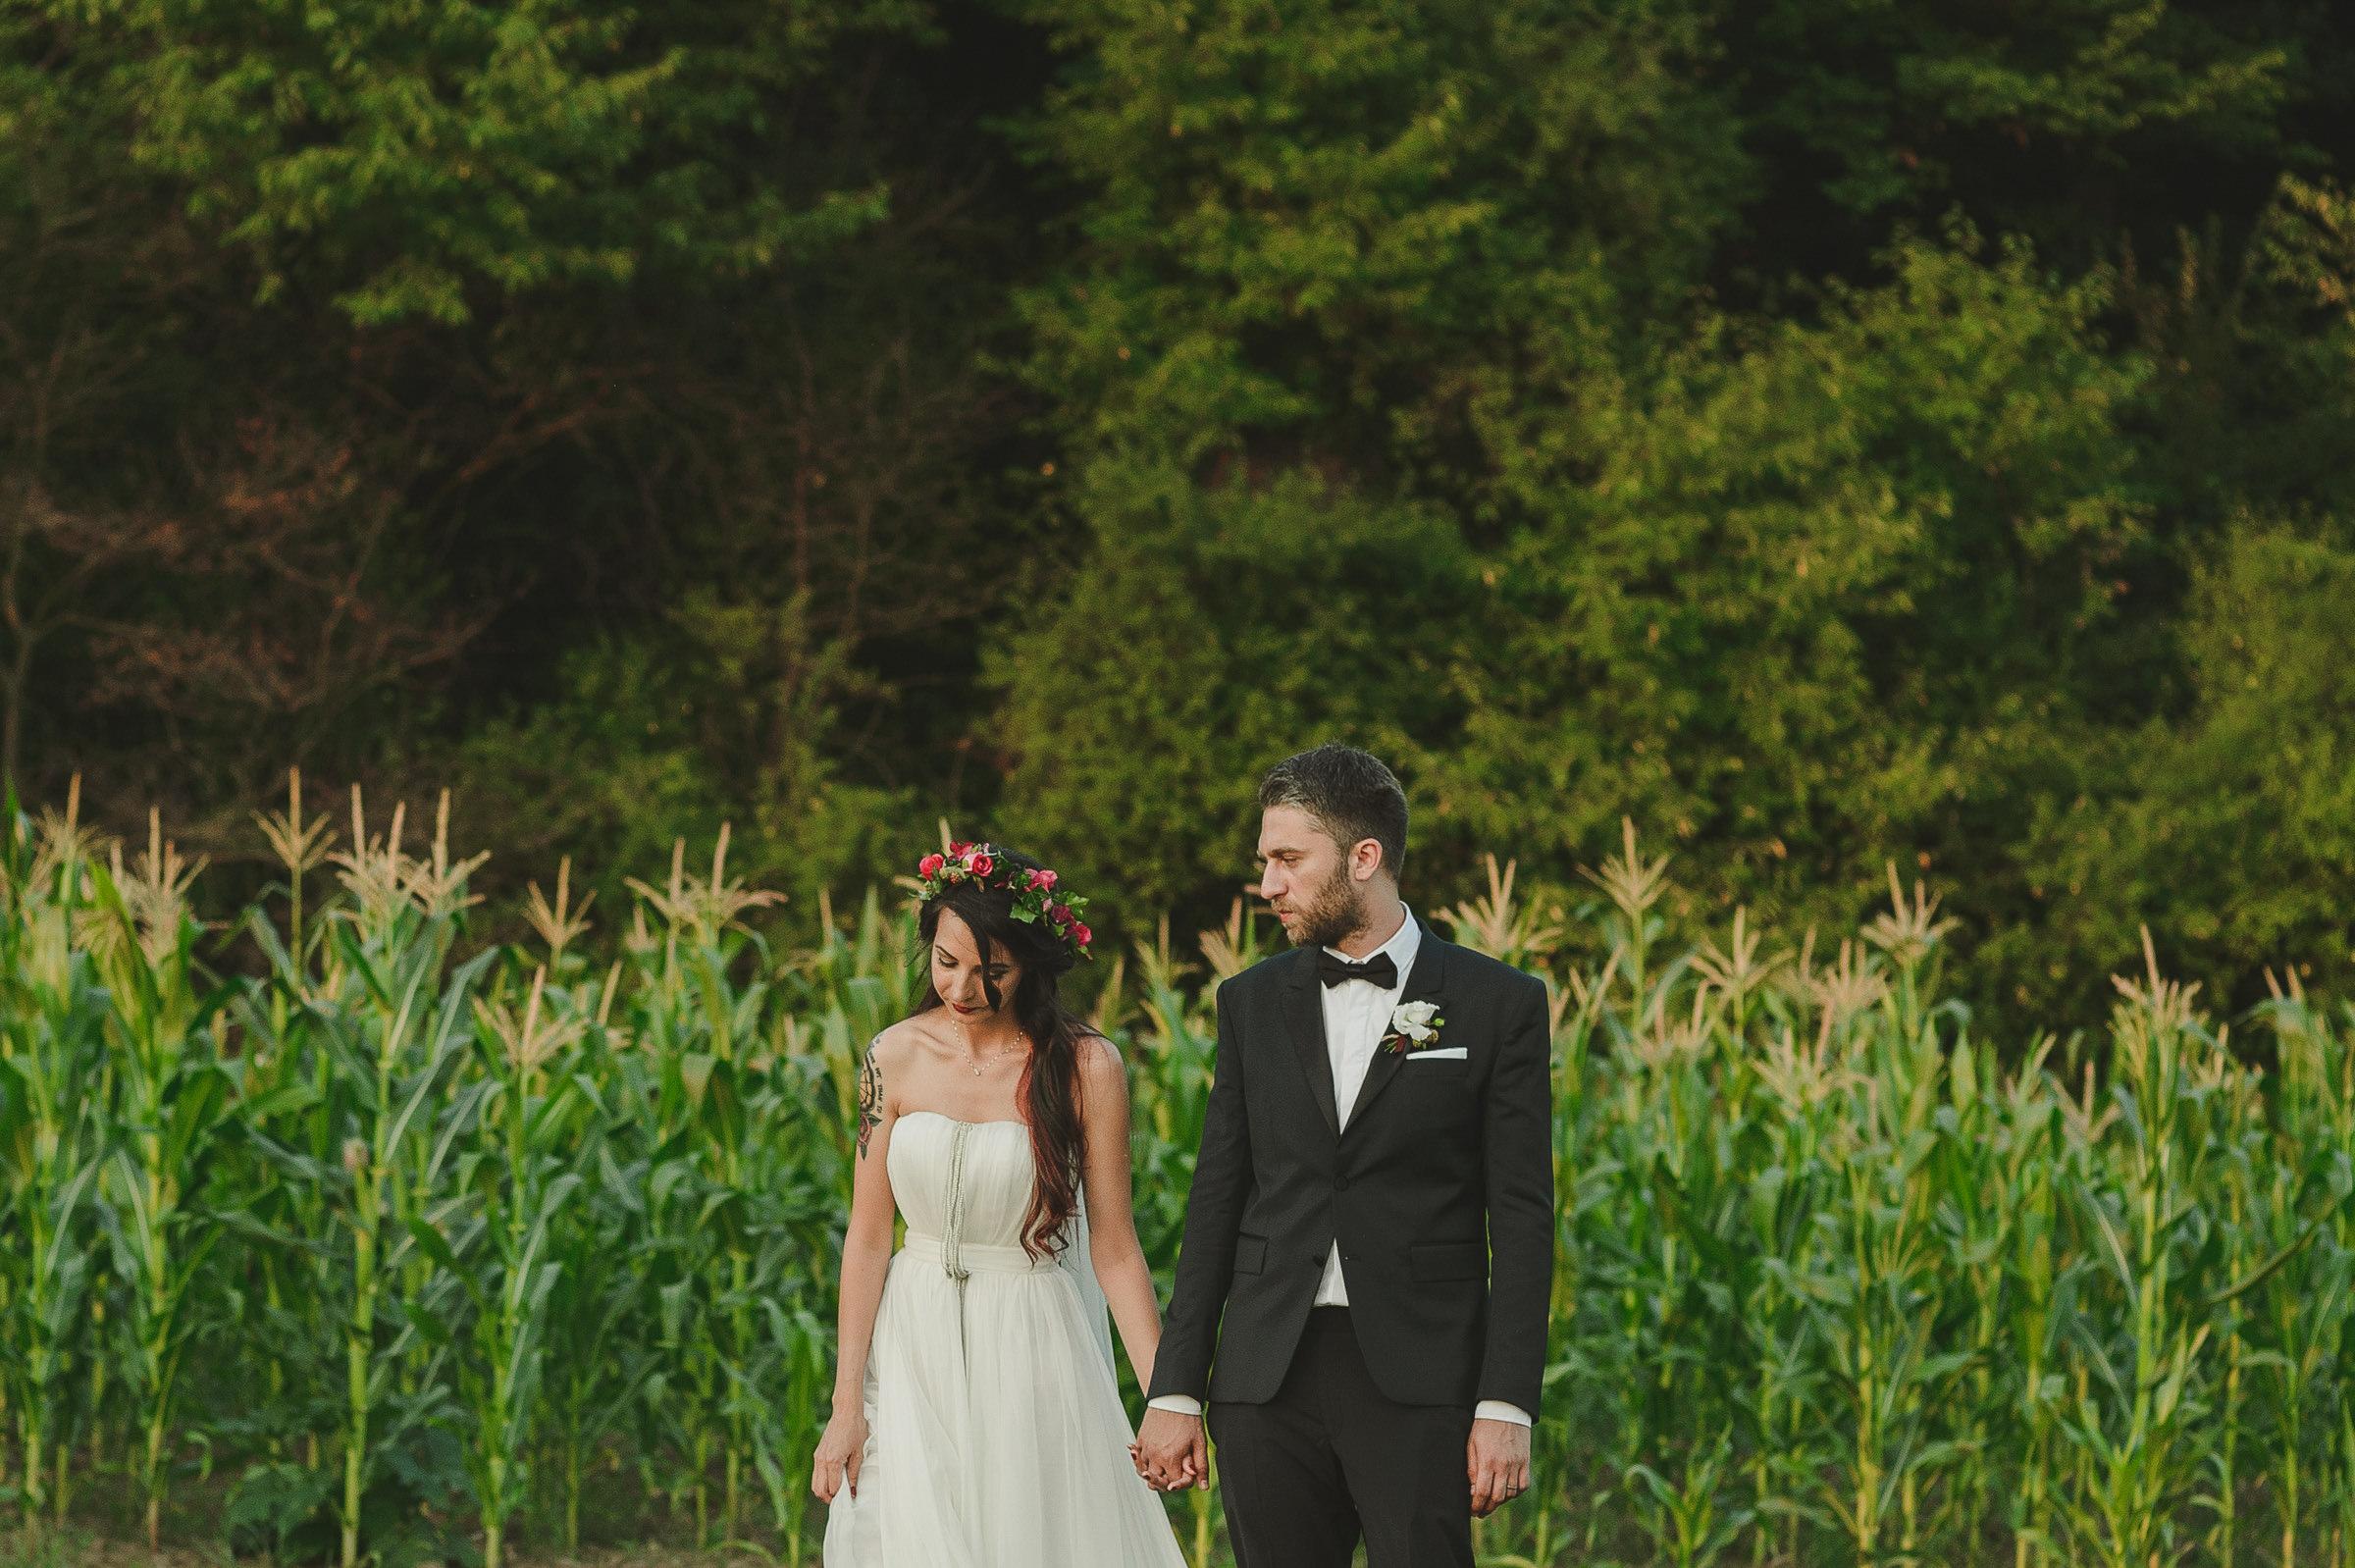 Nunta In Aer Liber Bucuresti